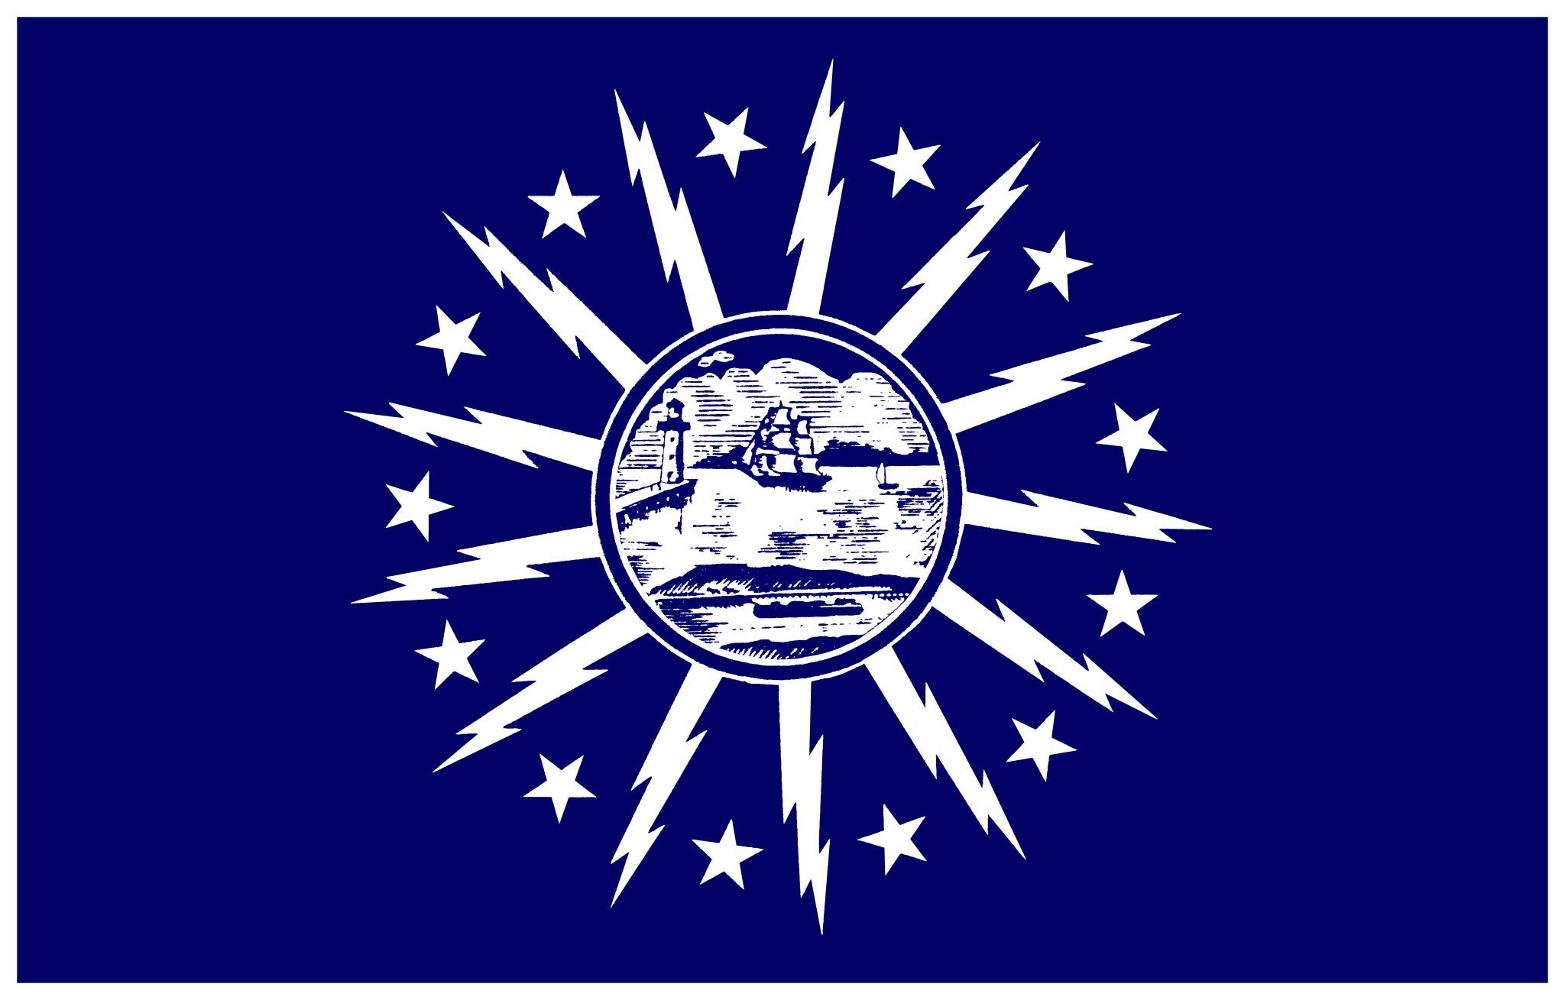 Buffalo New York Flags